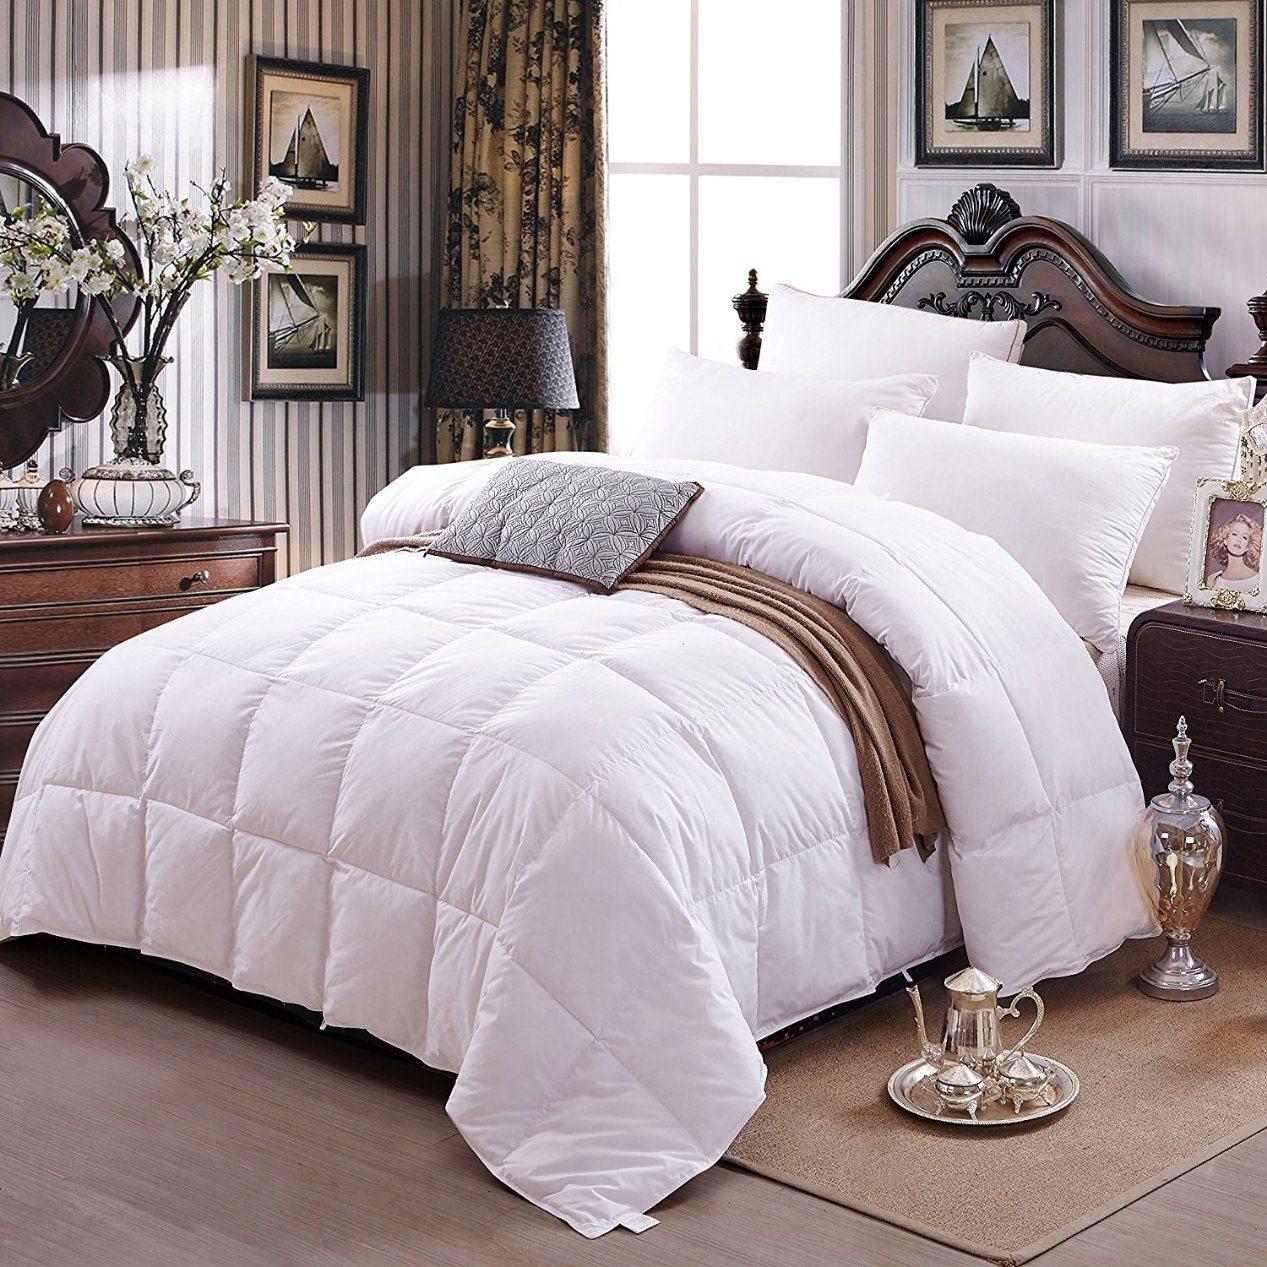 Home Textile 233tc 75% White Duck Down Bedding Comforter